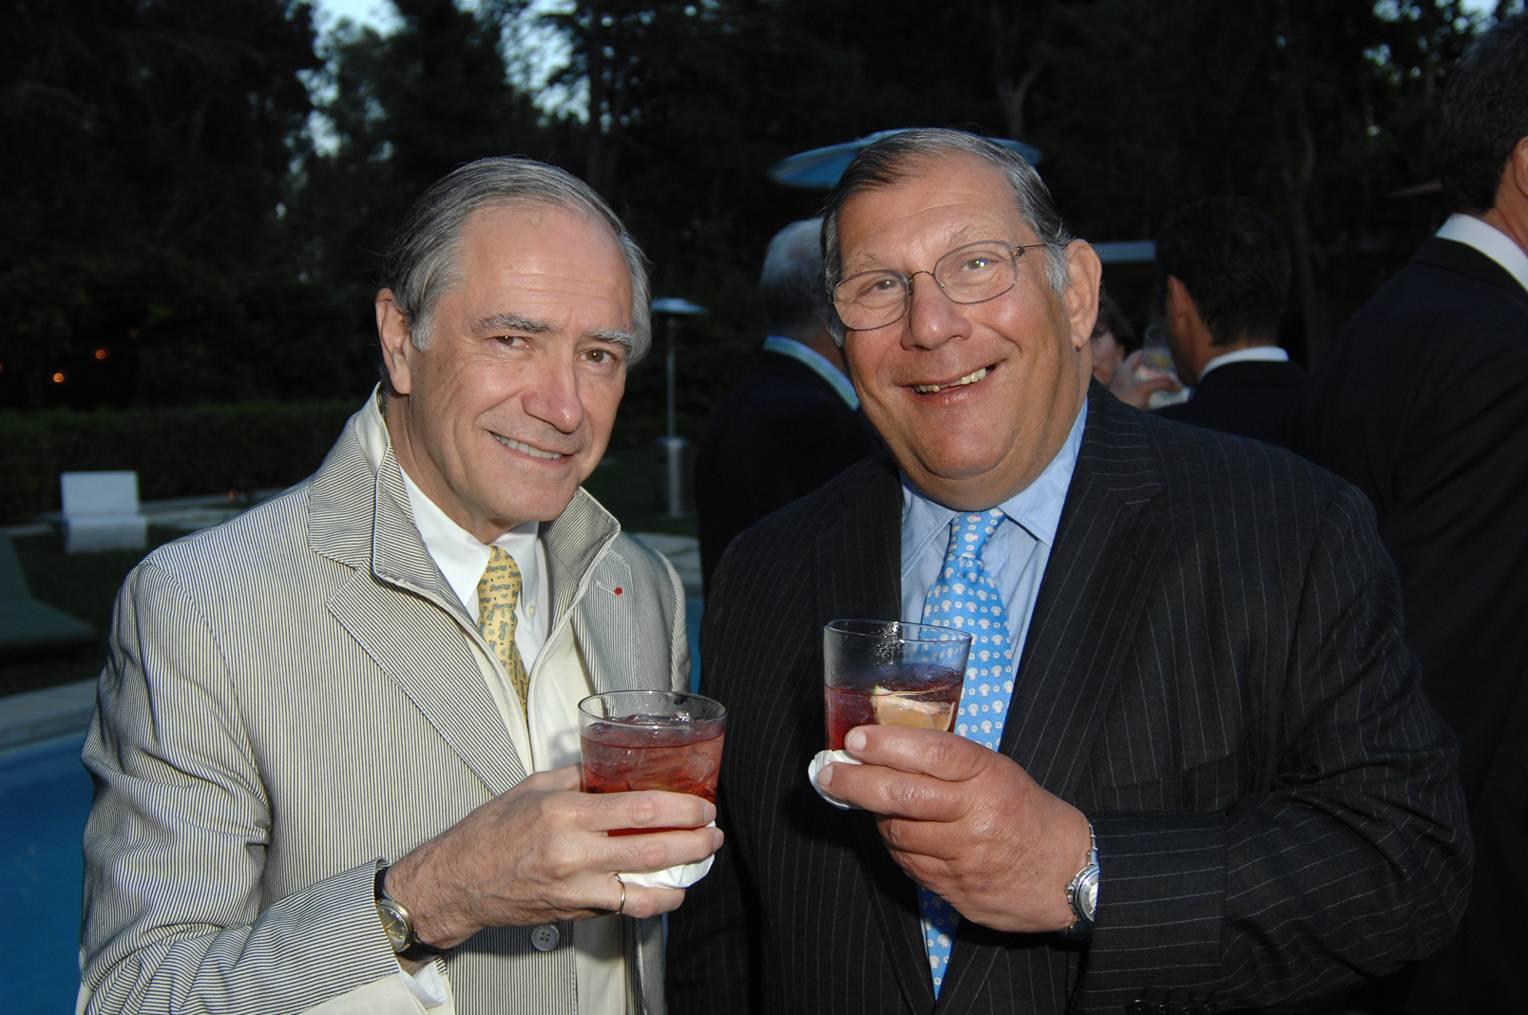 Christopher Kip Forbes and Patrick Gerschel